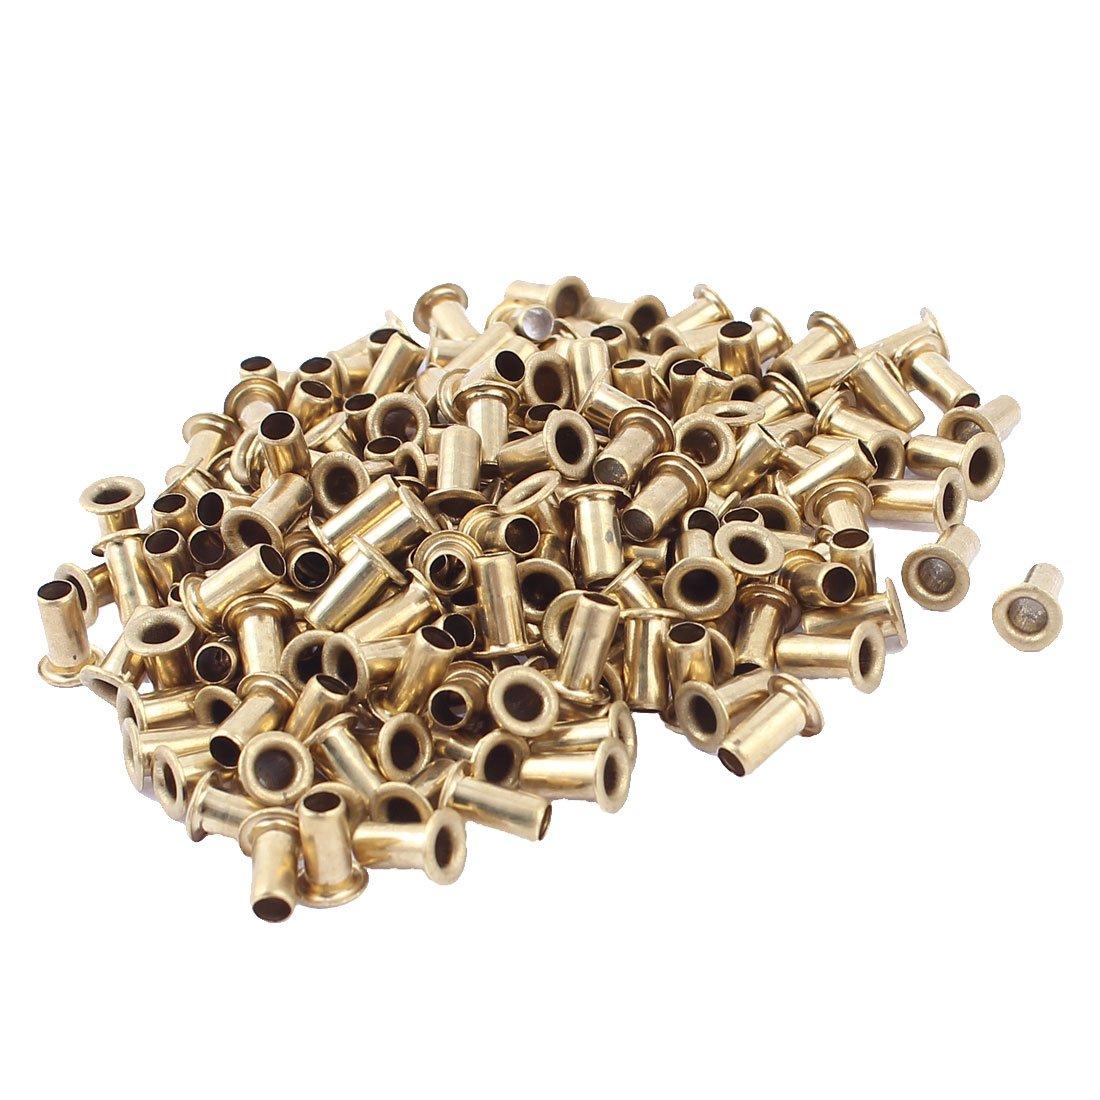 200 piezas M4x8 Through Orificio Remaches Hueco Arandelas PCB Placa De Circuito Sourcingmap a15091700ux0364